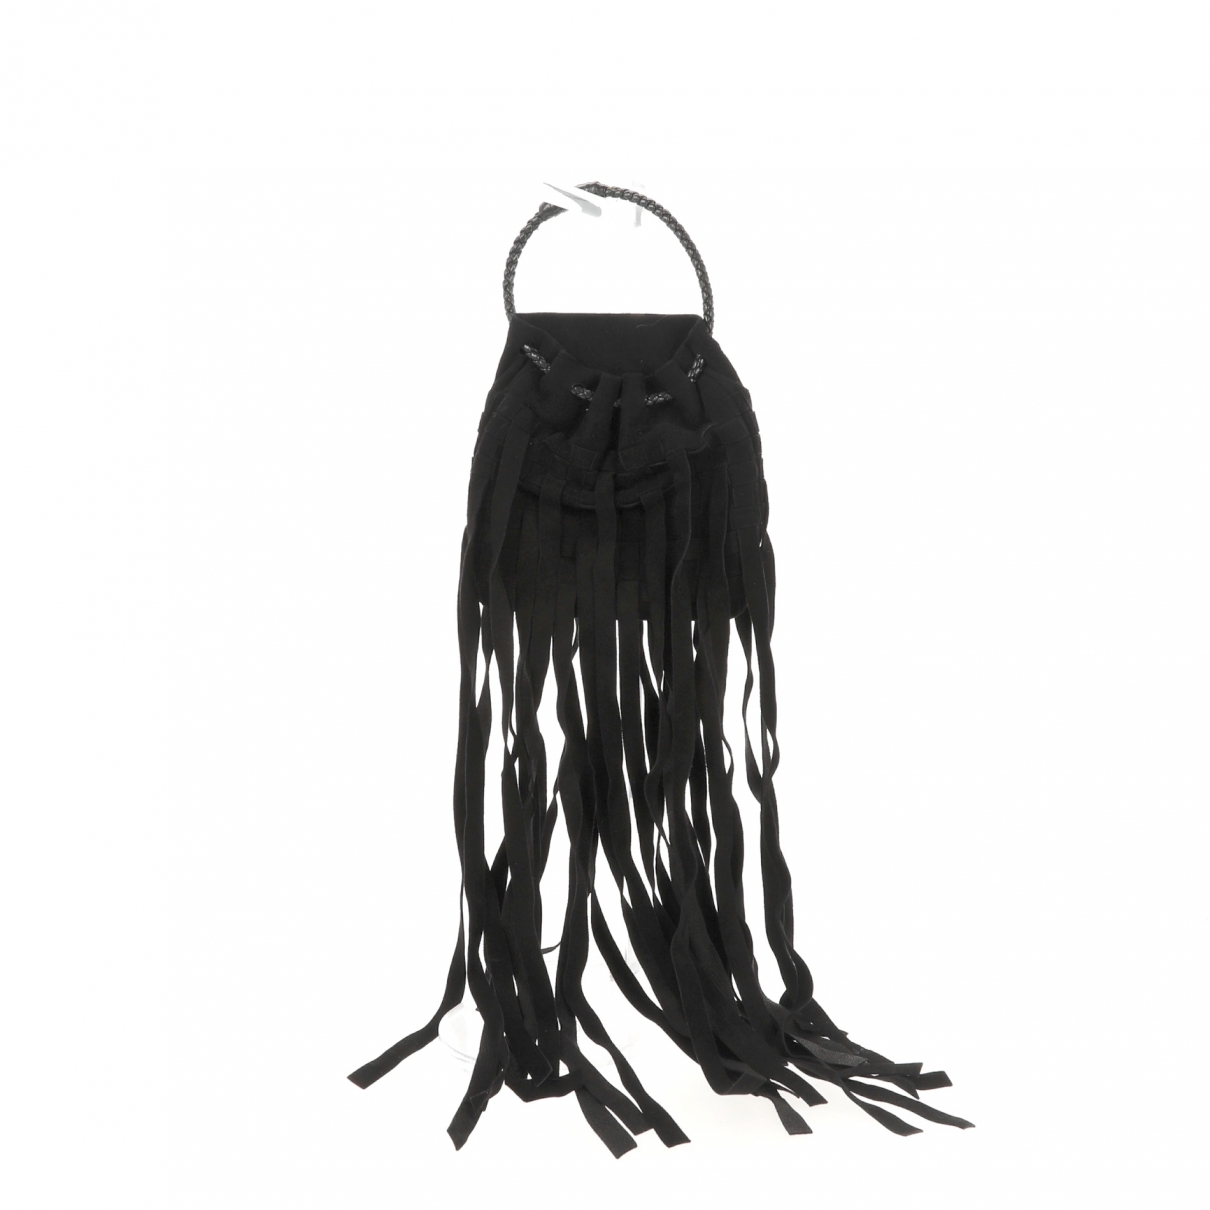 Bottega Veneta - Sac a main   pour femme en suede - noir